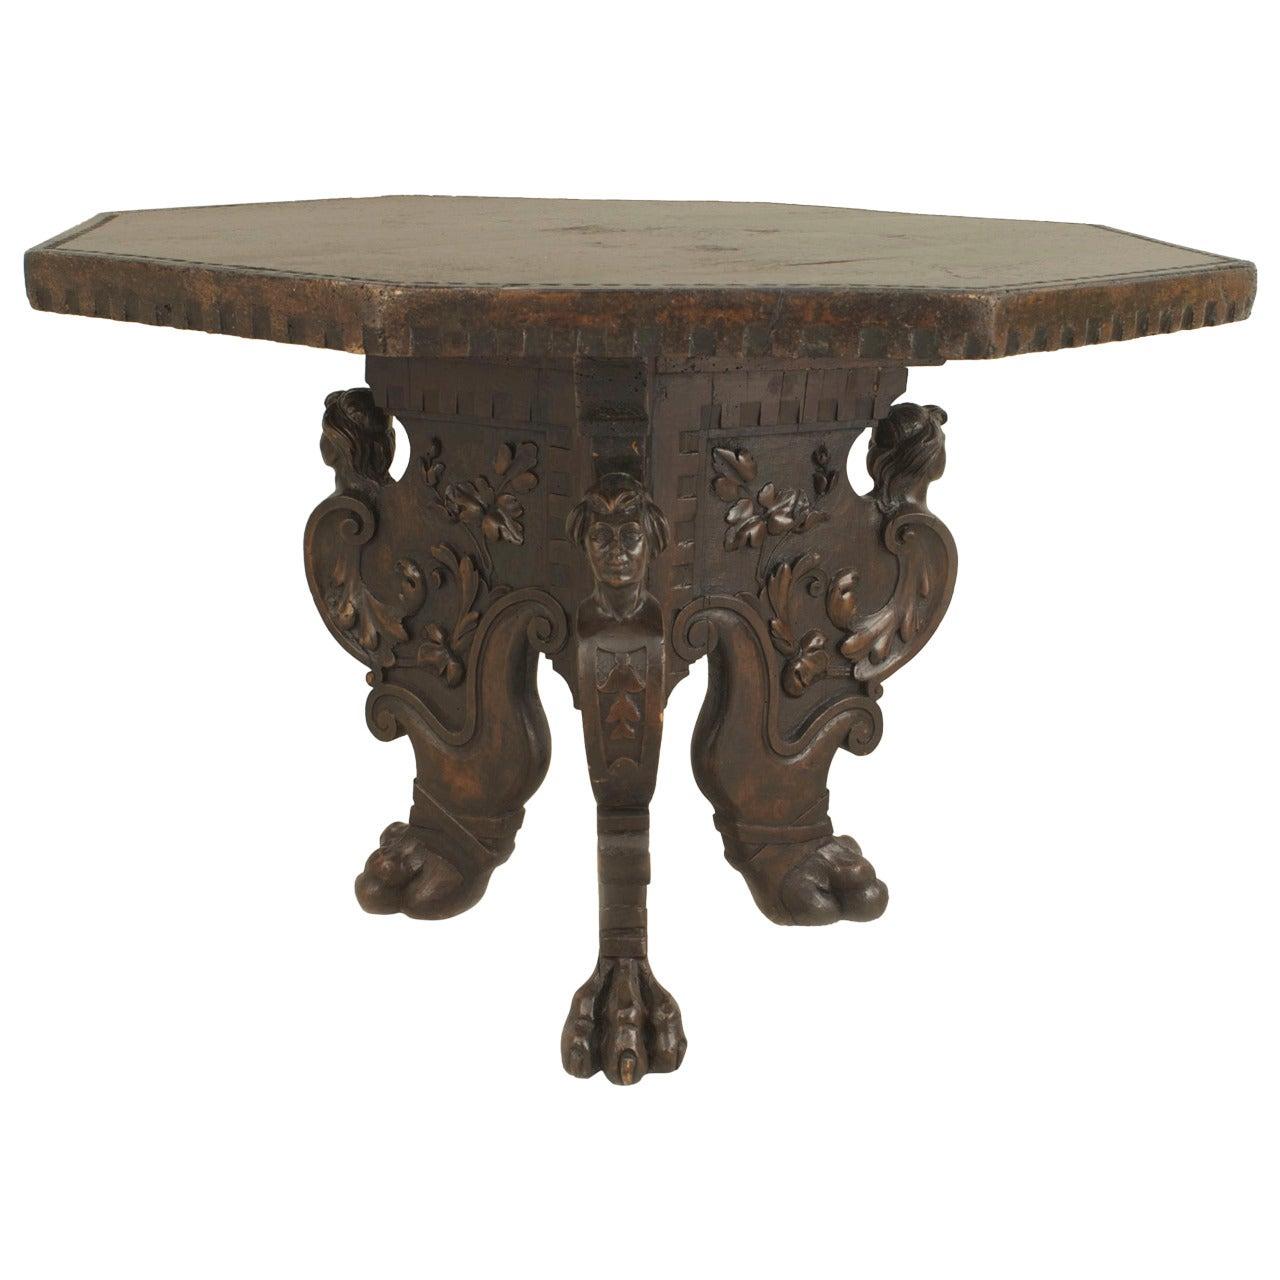 Italian Renaissance Revival Walnut Table